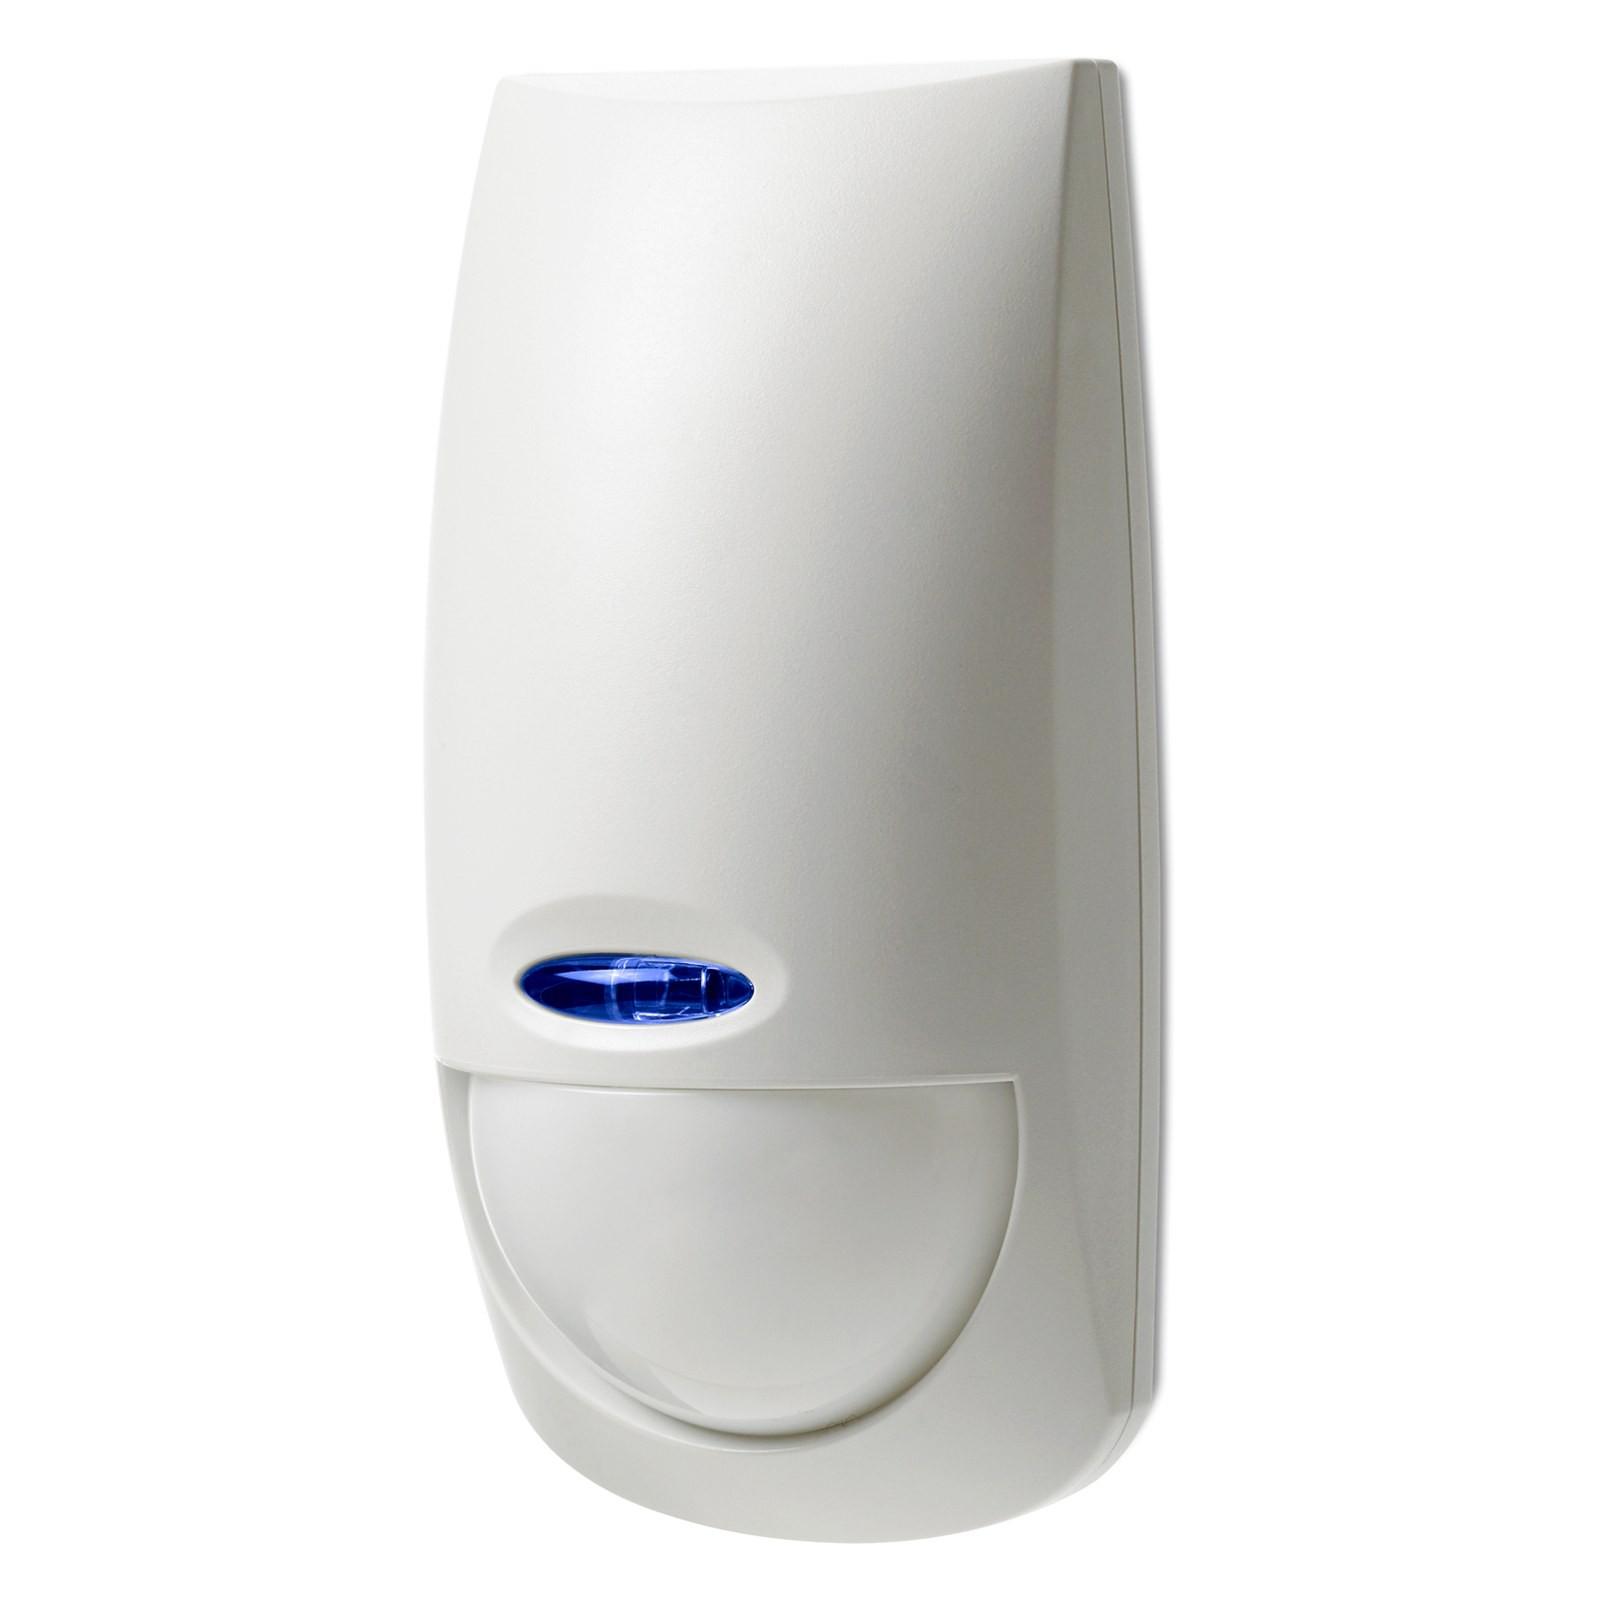 Kit Allarme Antifurto BENTEL Casa Centrale KYO32 Sistema con Sirena + Sensori - Area Illumina